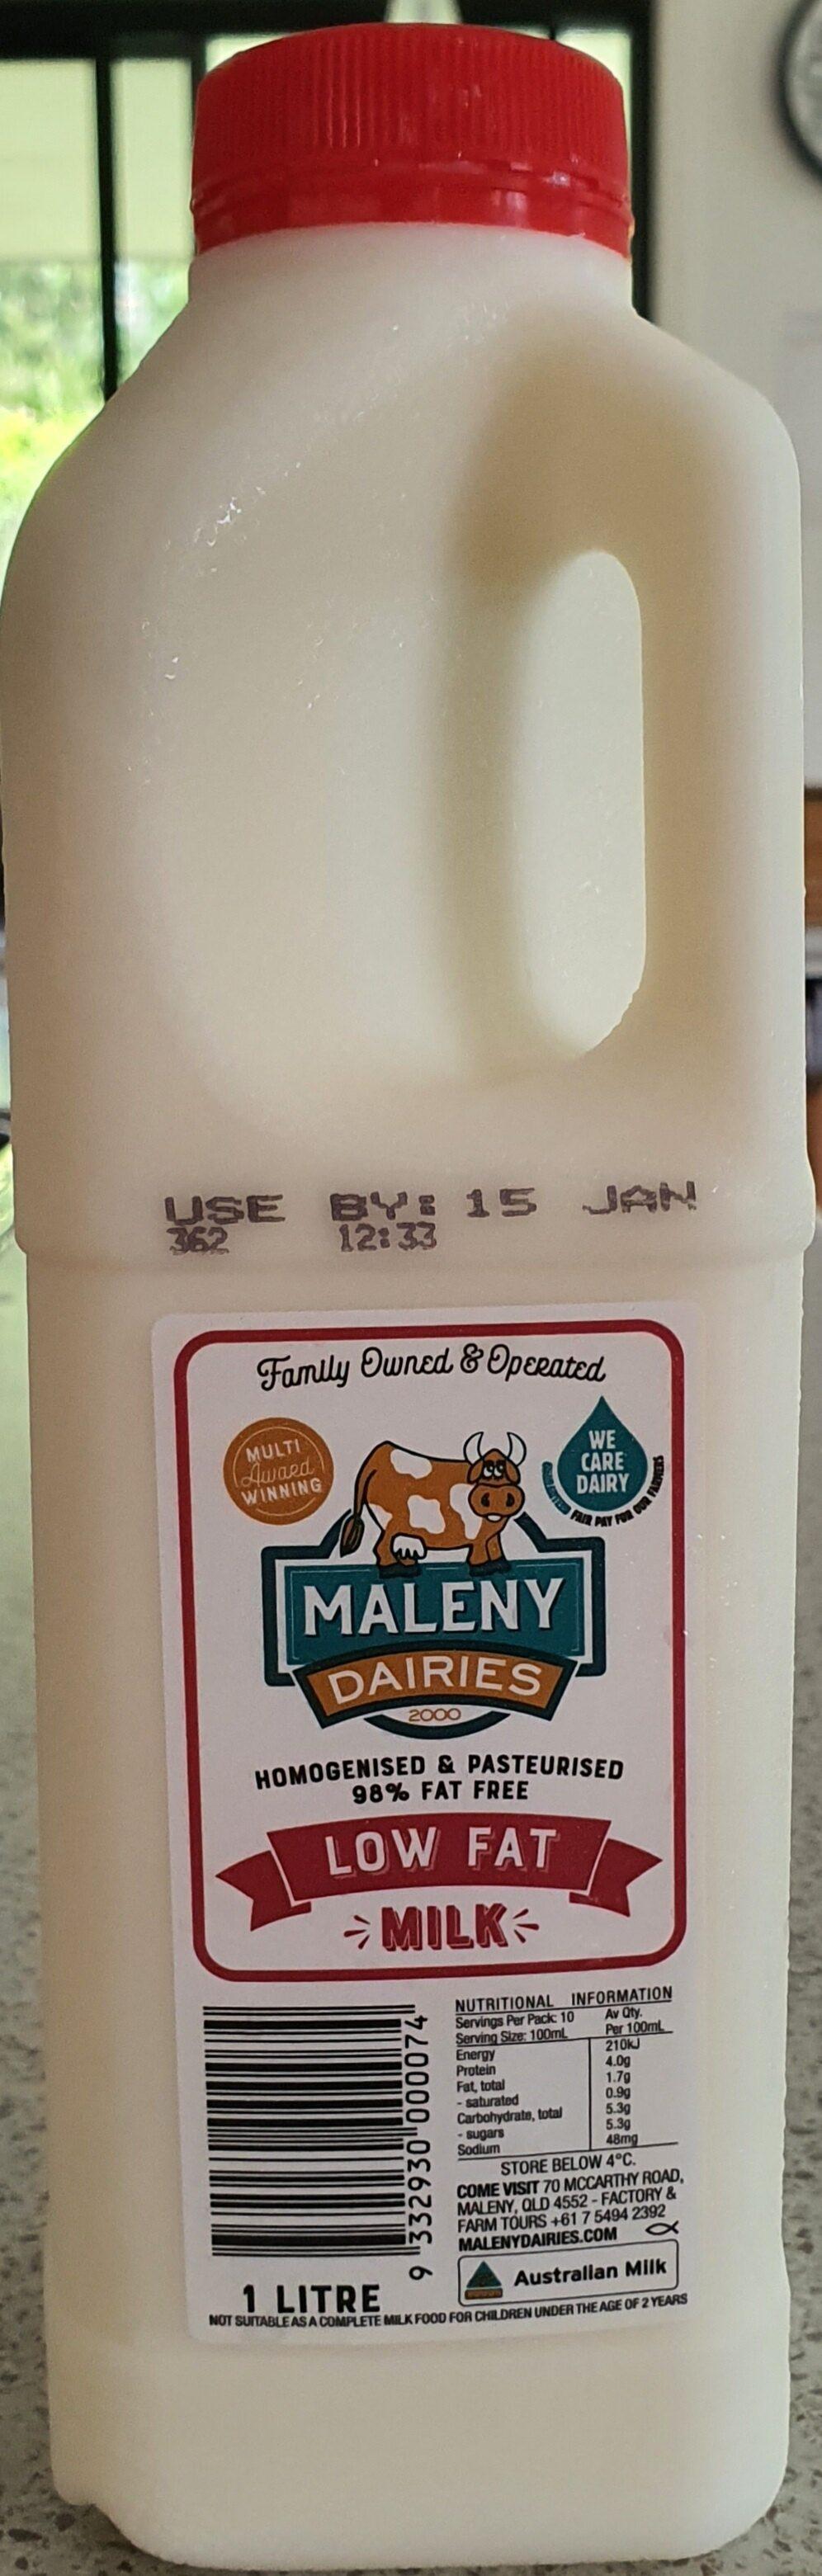 Maleny Dairies Low Fat Milk - Product - en